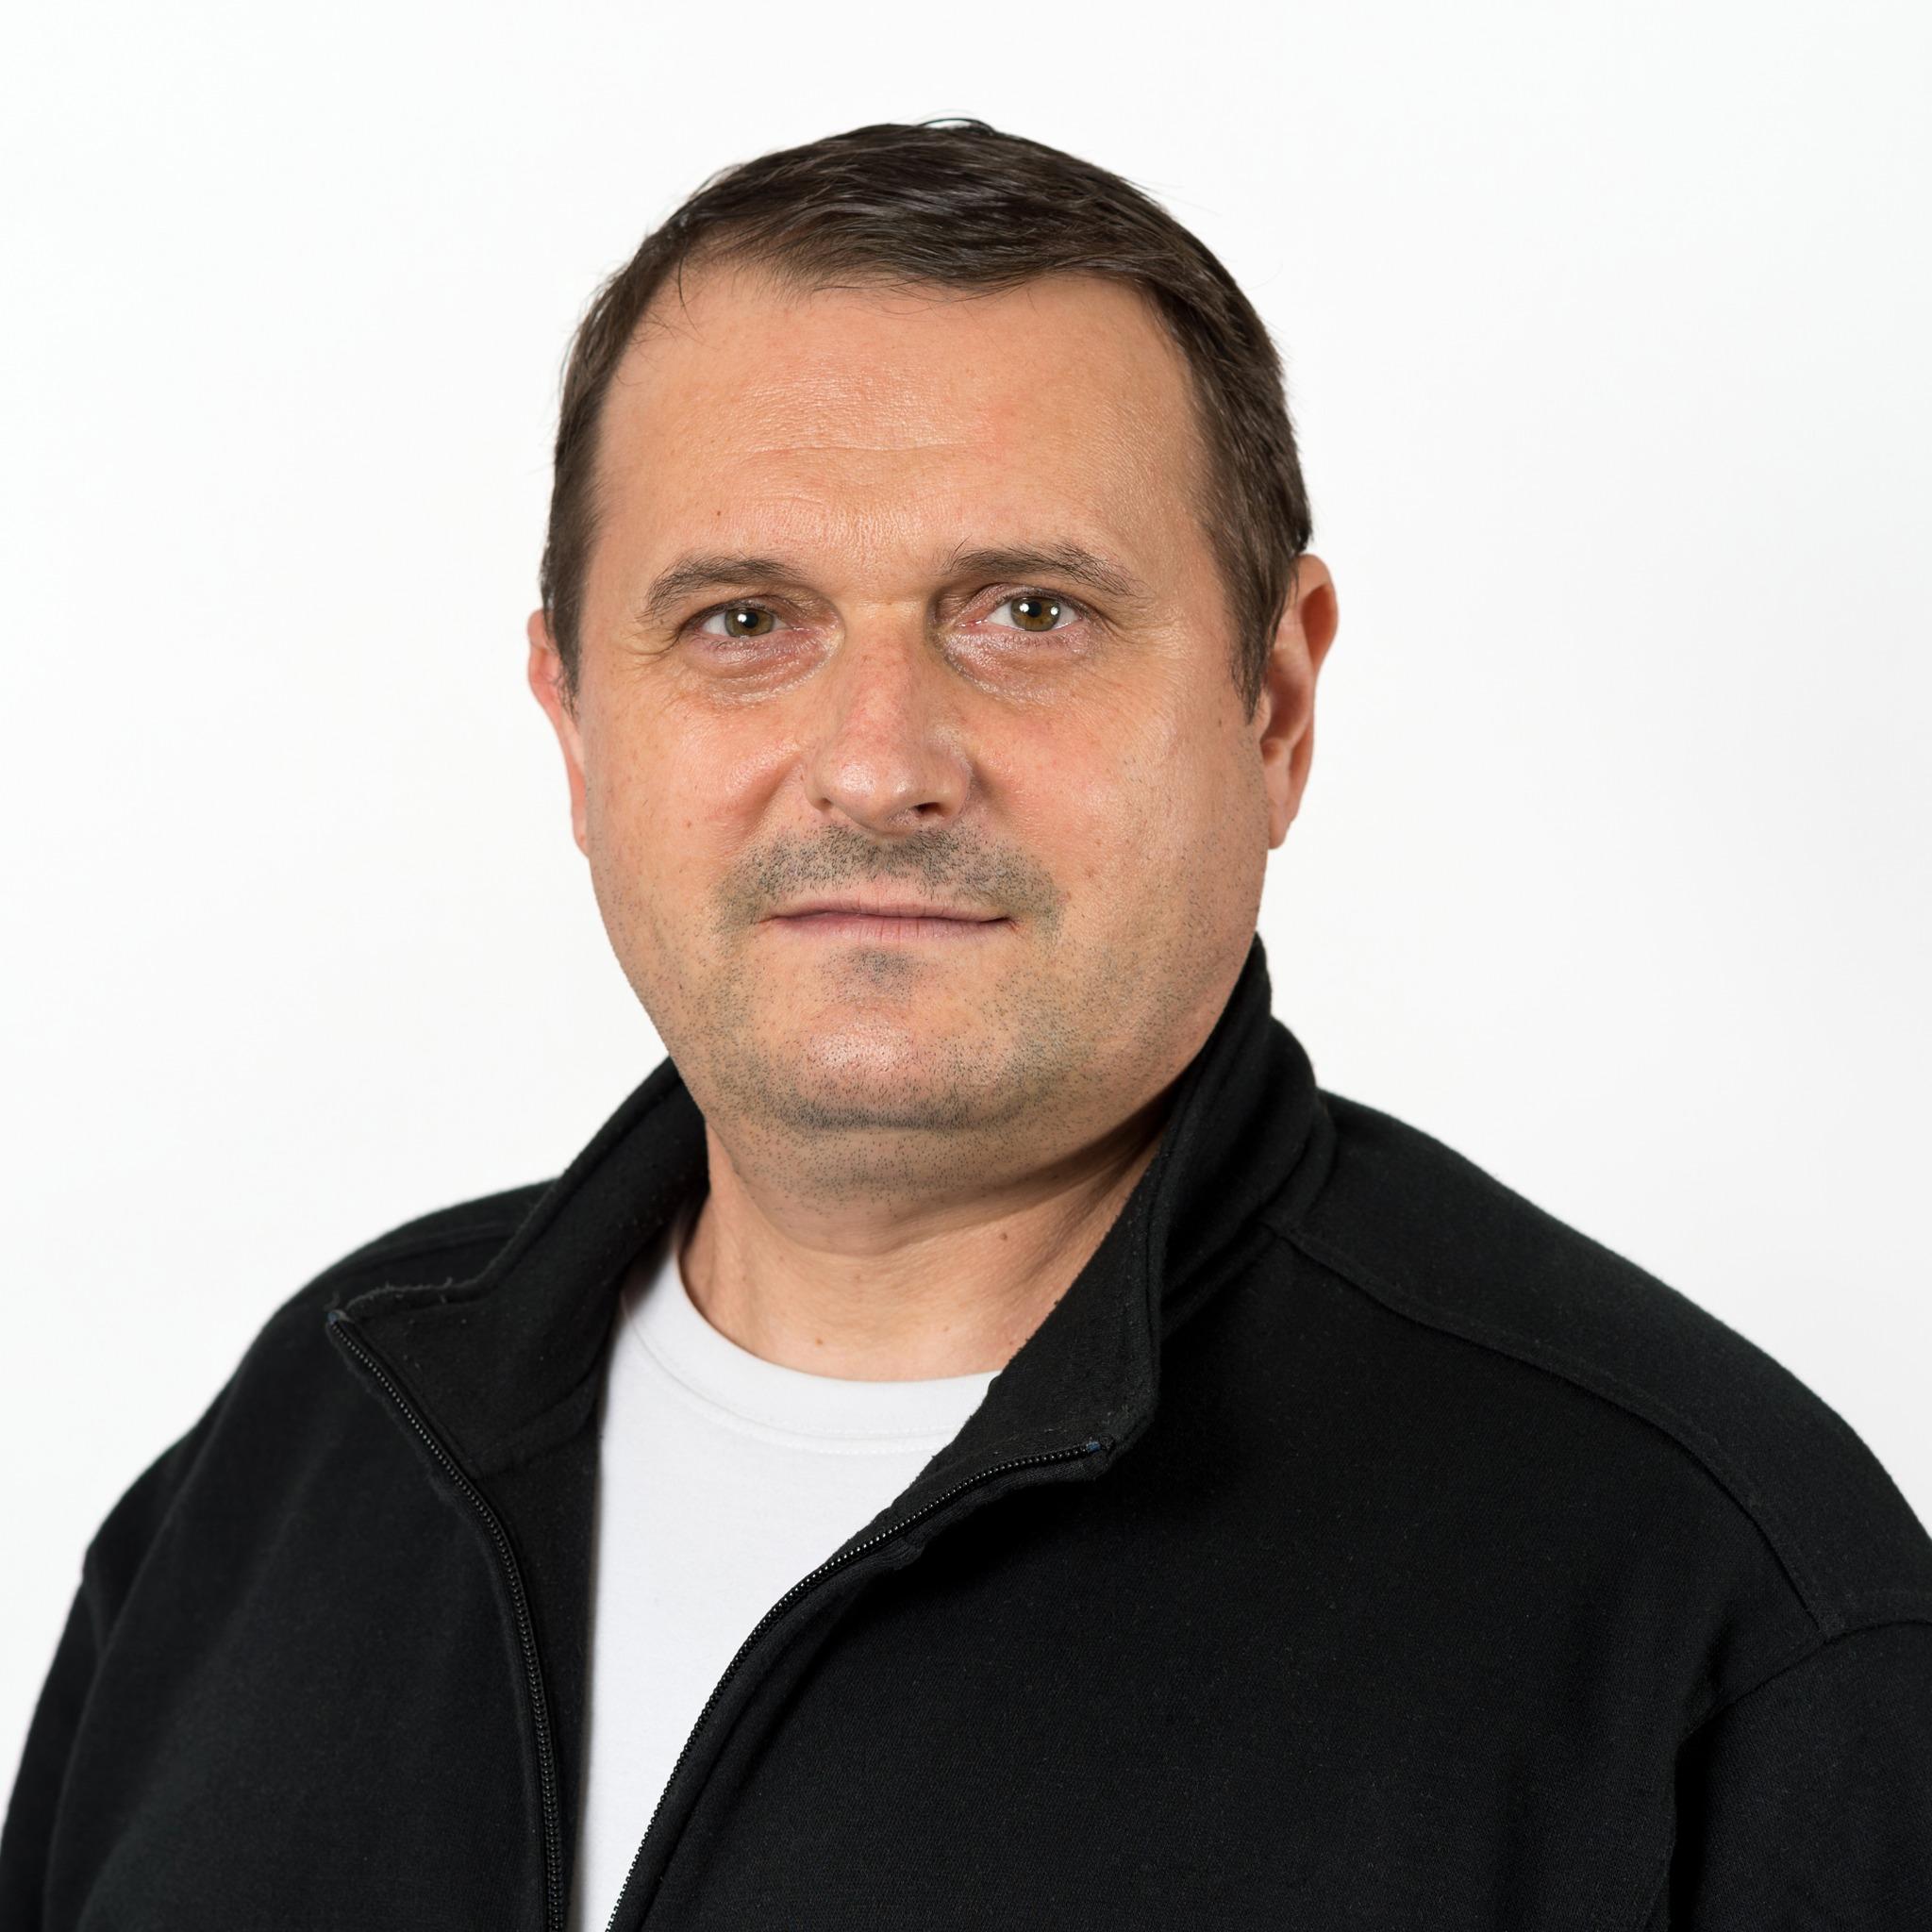 Danijel Mosnak